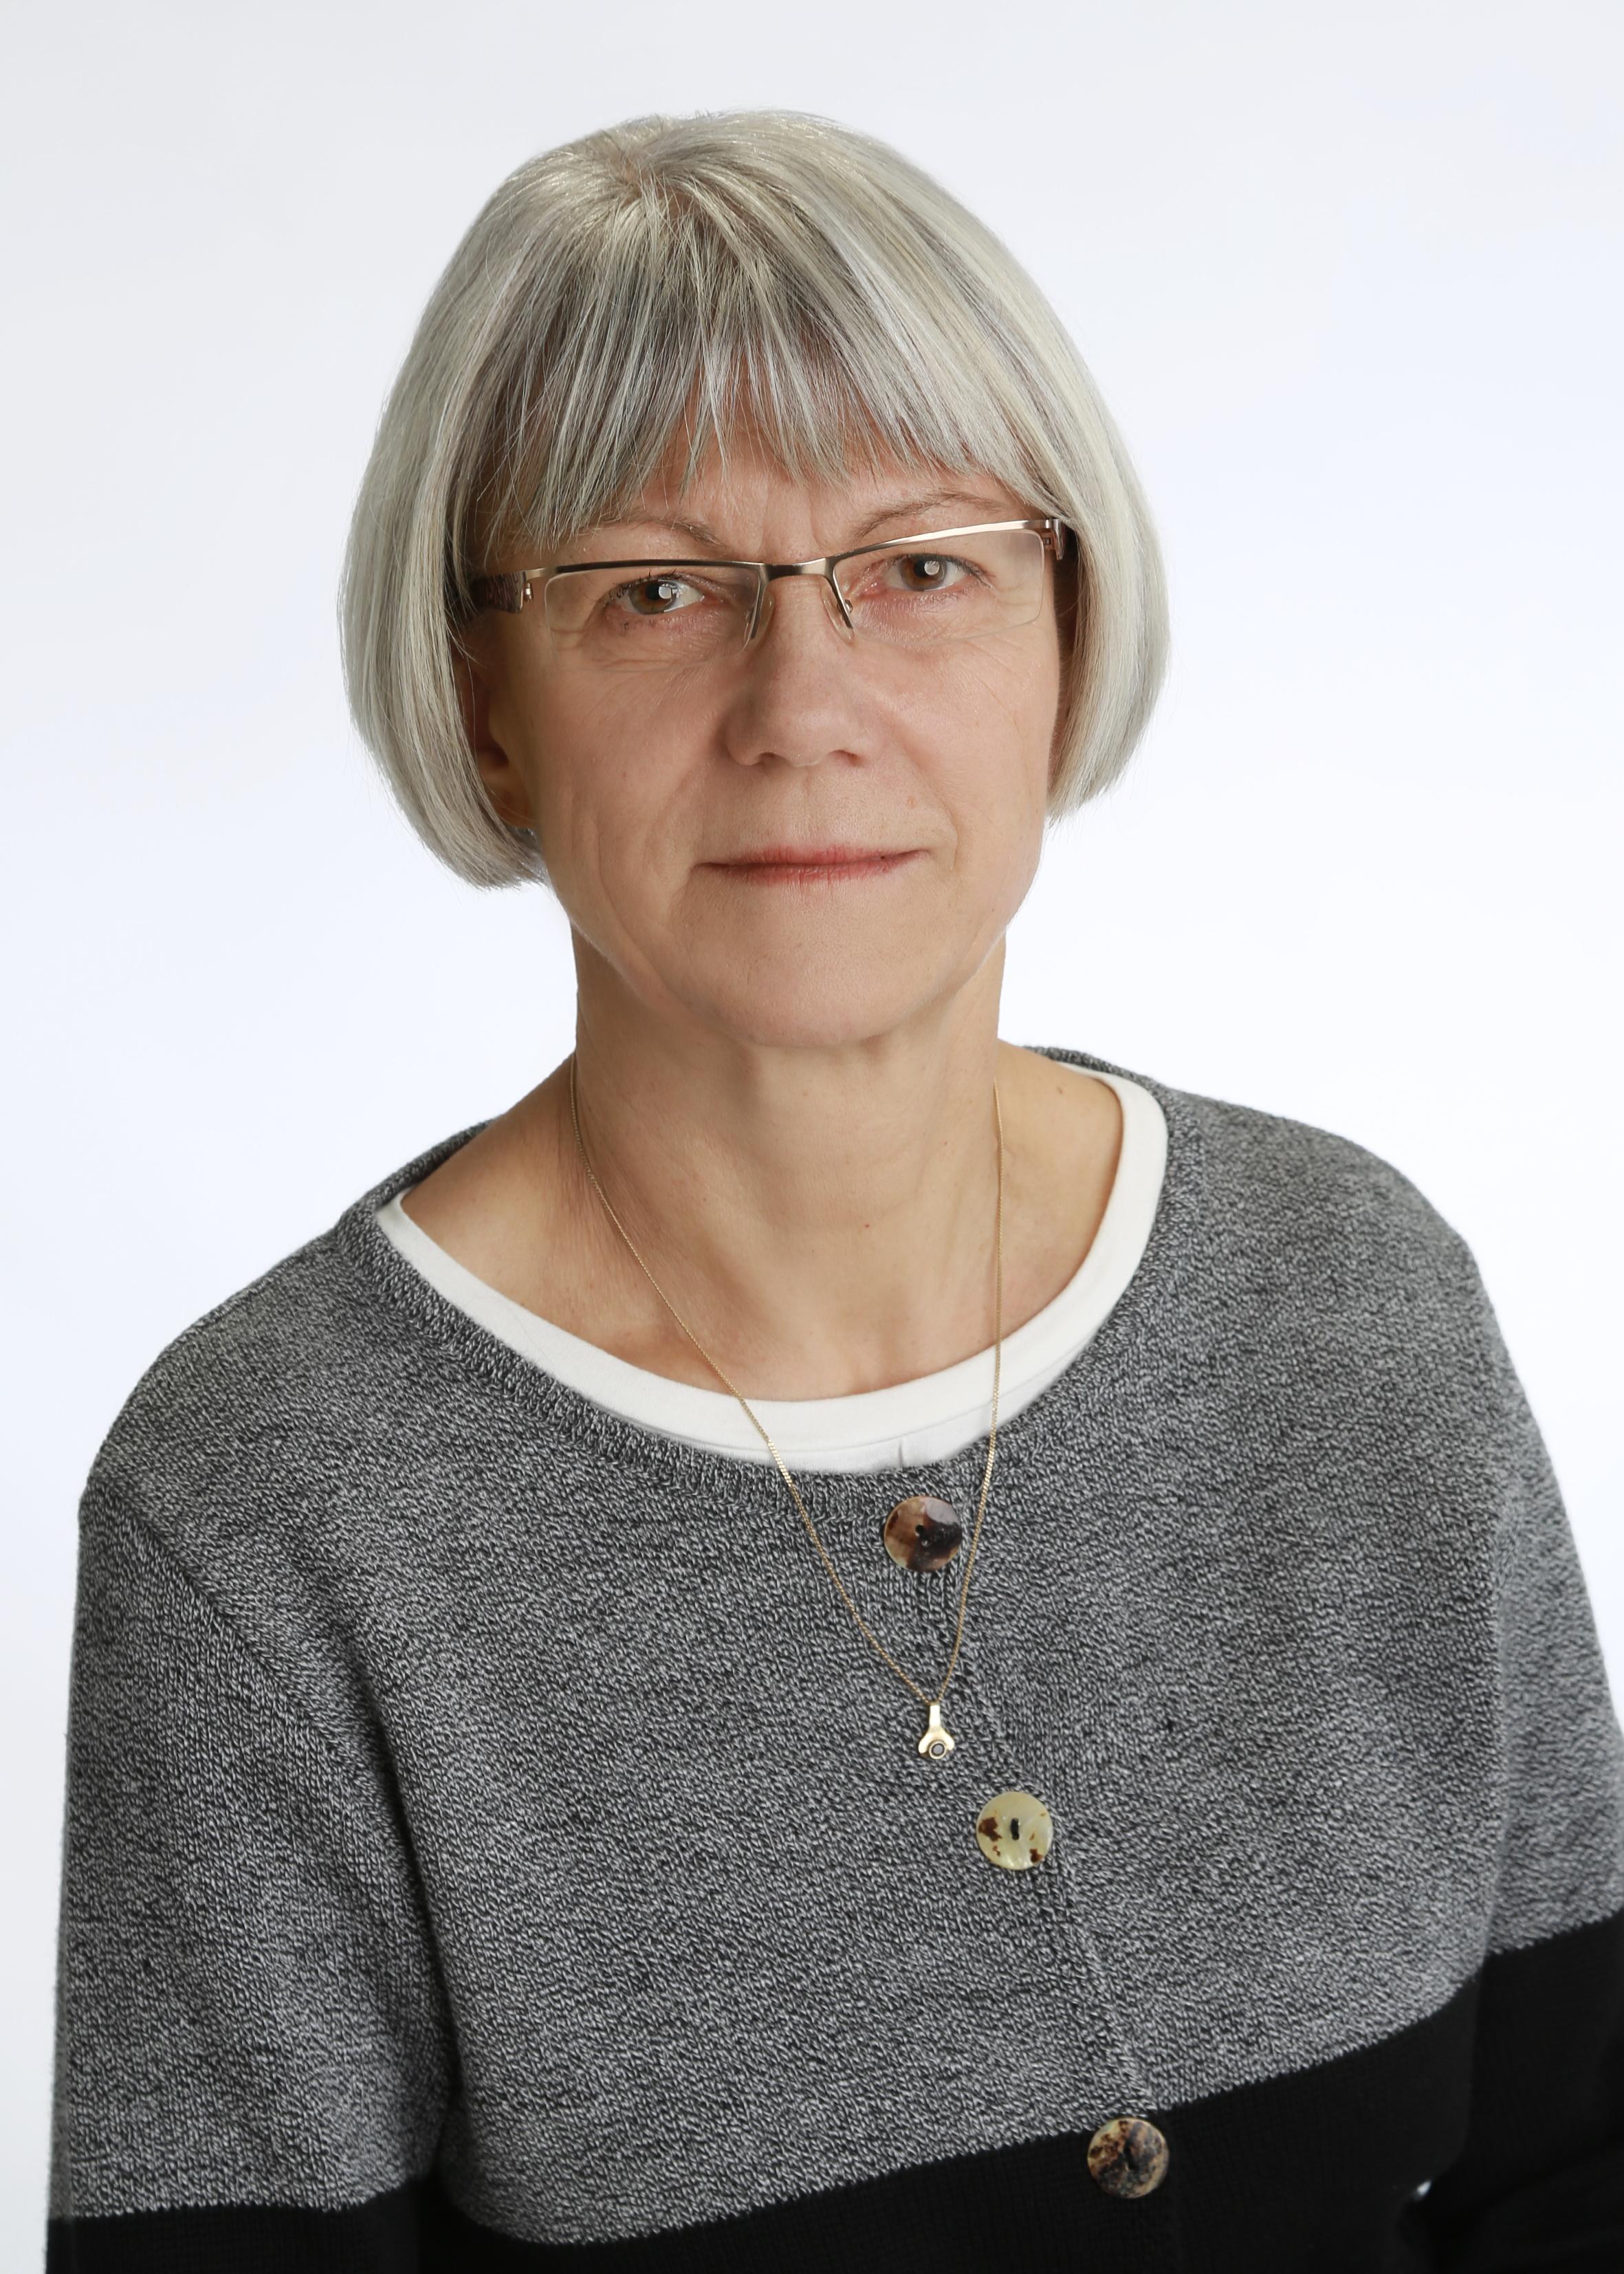 Karin Thiel